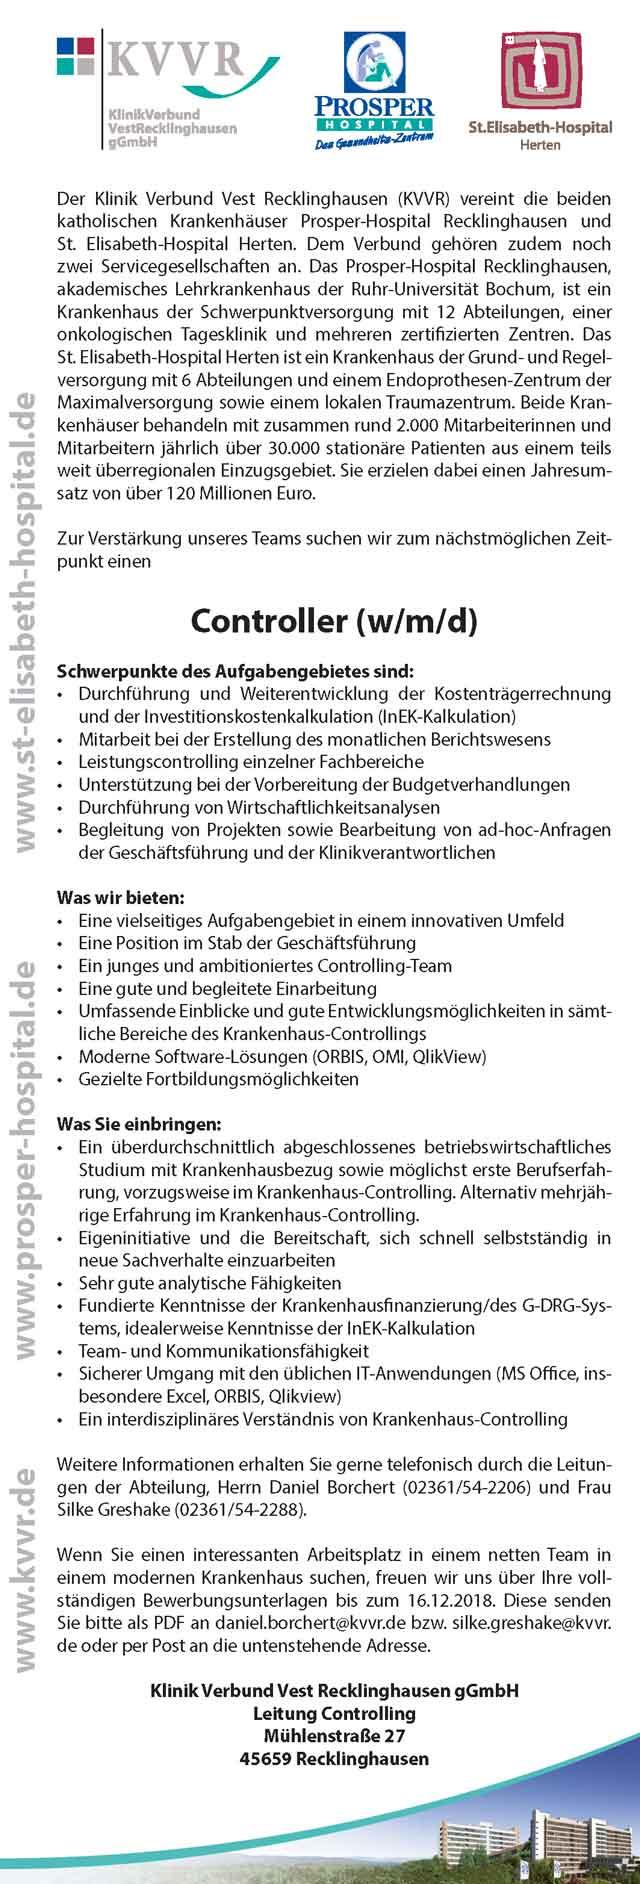 Klinik Verbund Vest Recklinghausen gGmbH: Controller (w/m/d)